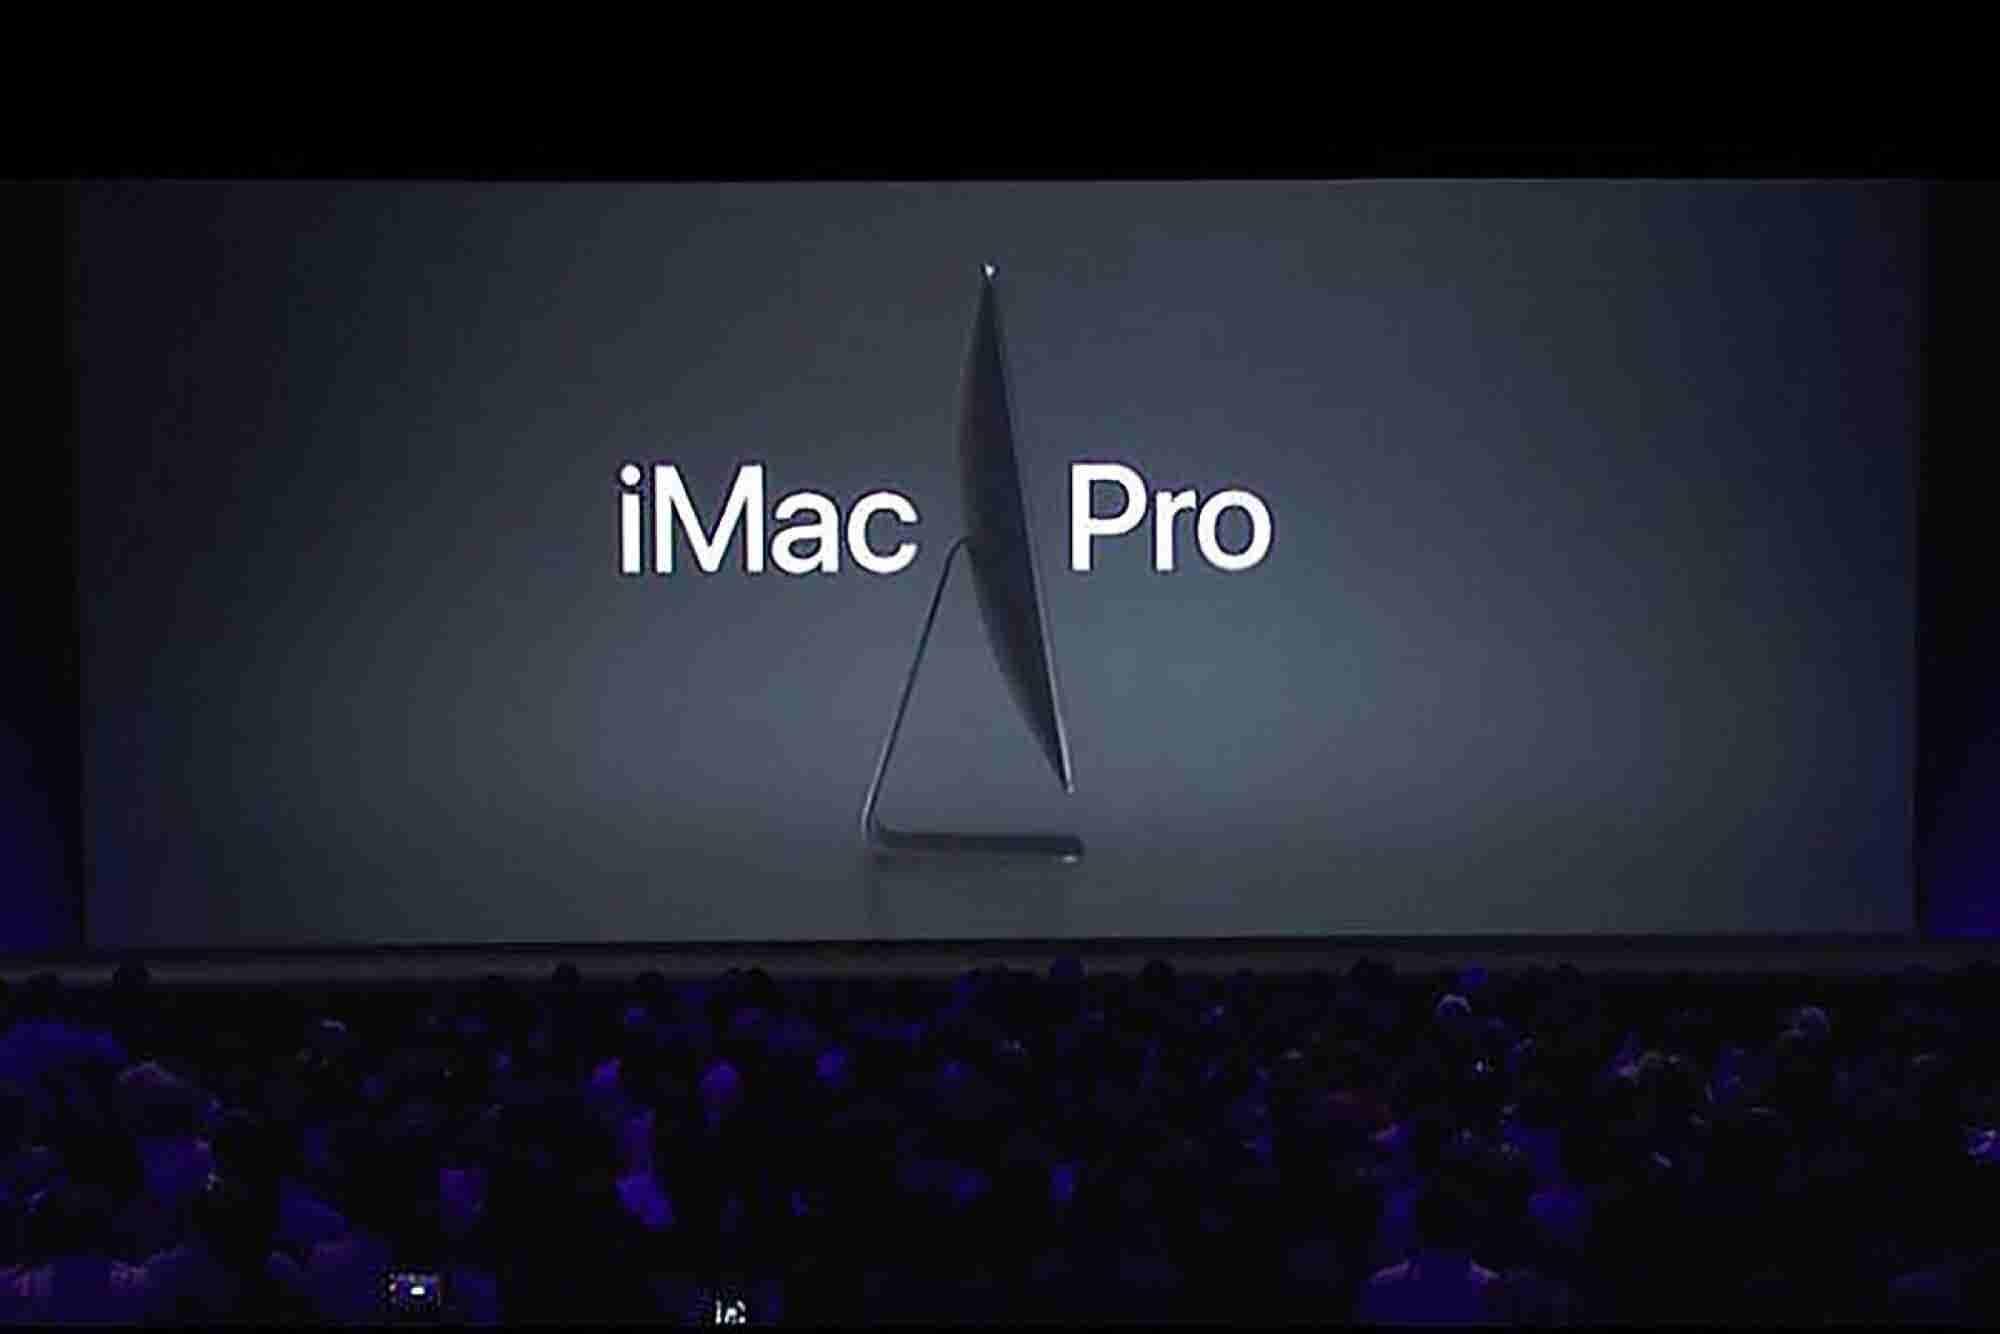 Apple Teases Behemoth iMac Pro and New MacBooks